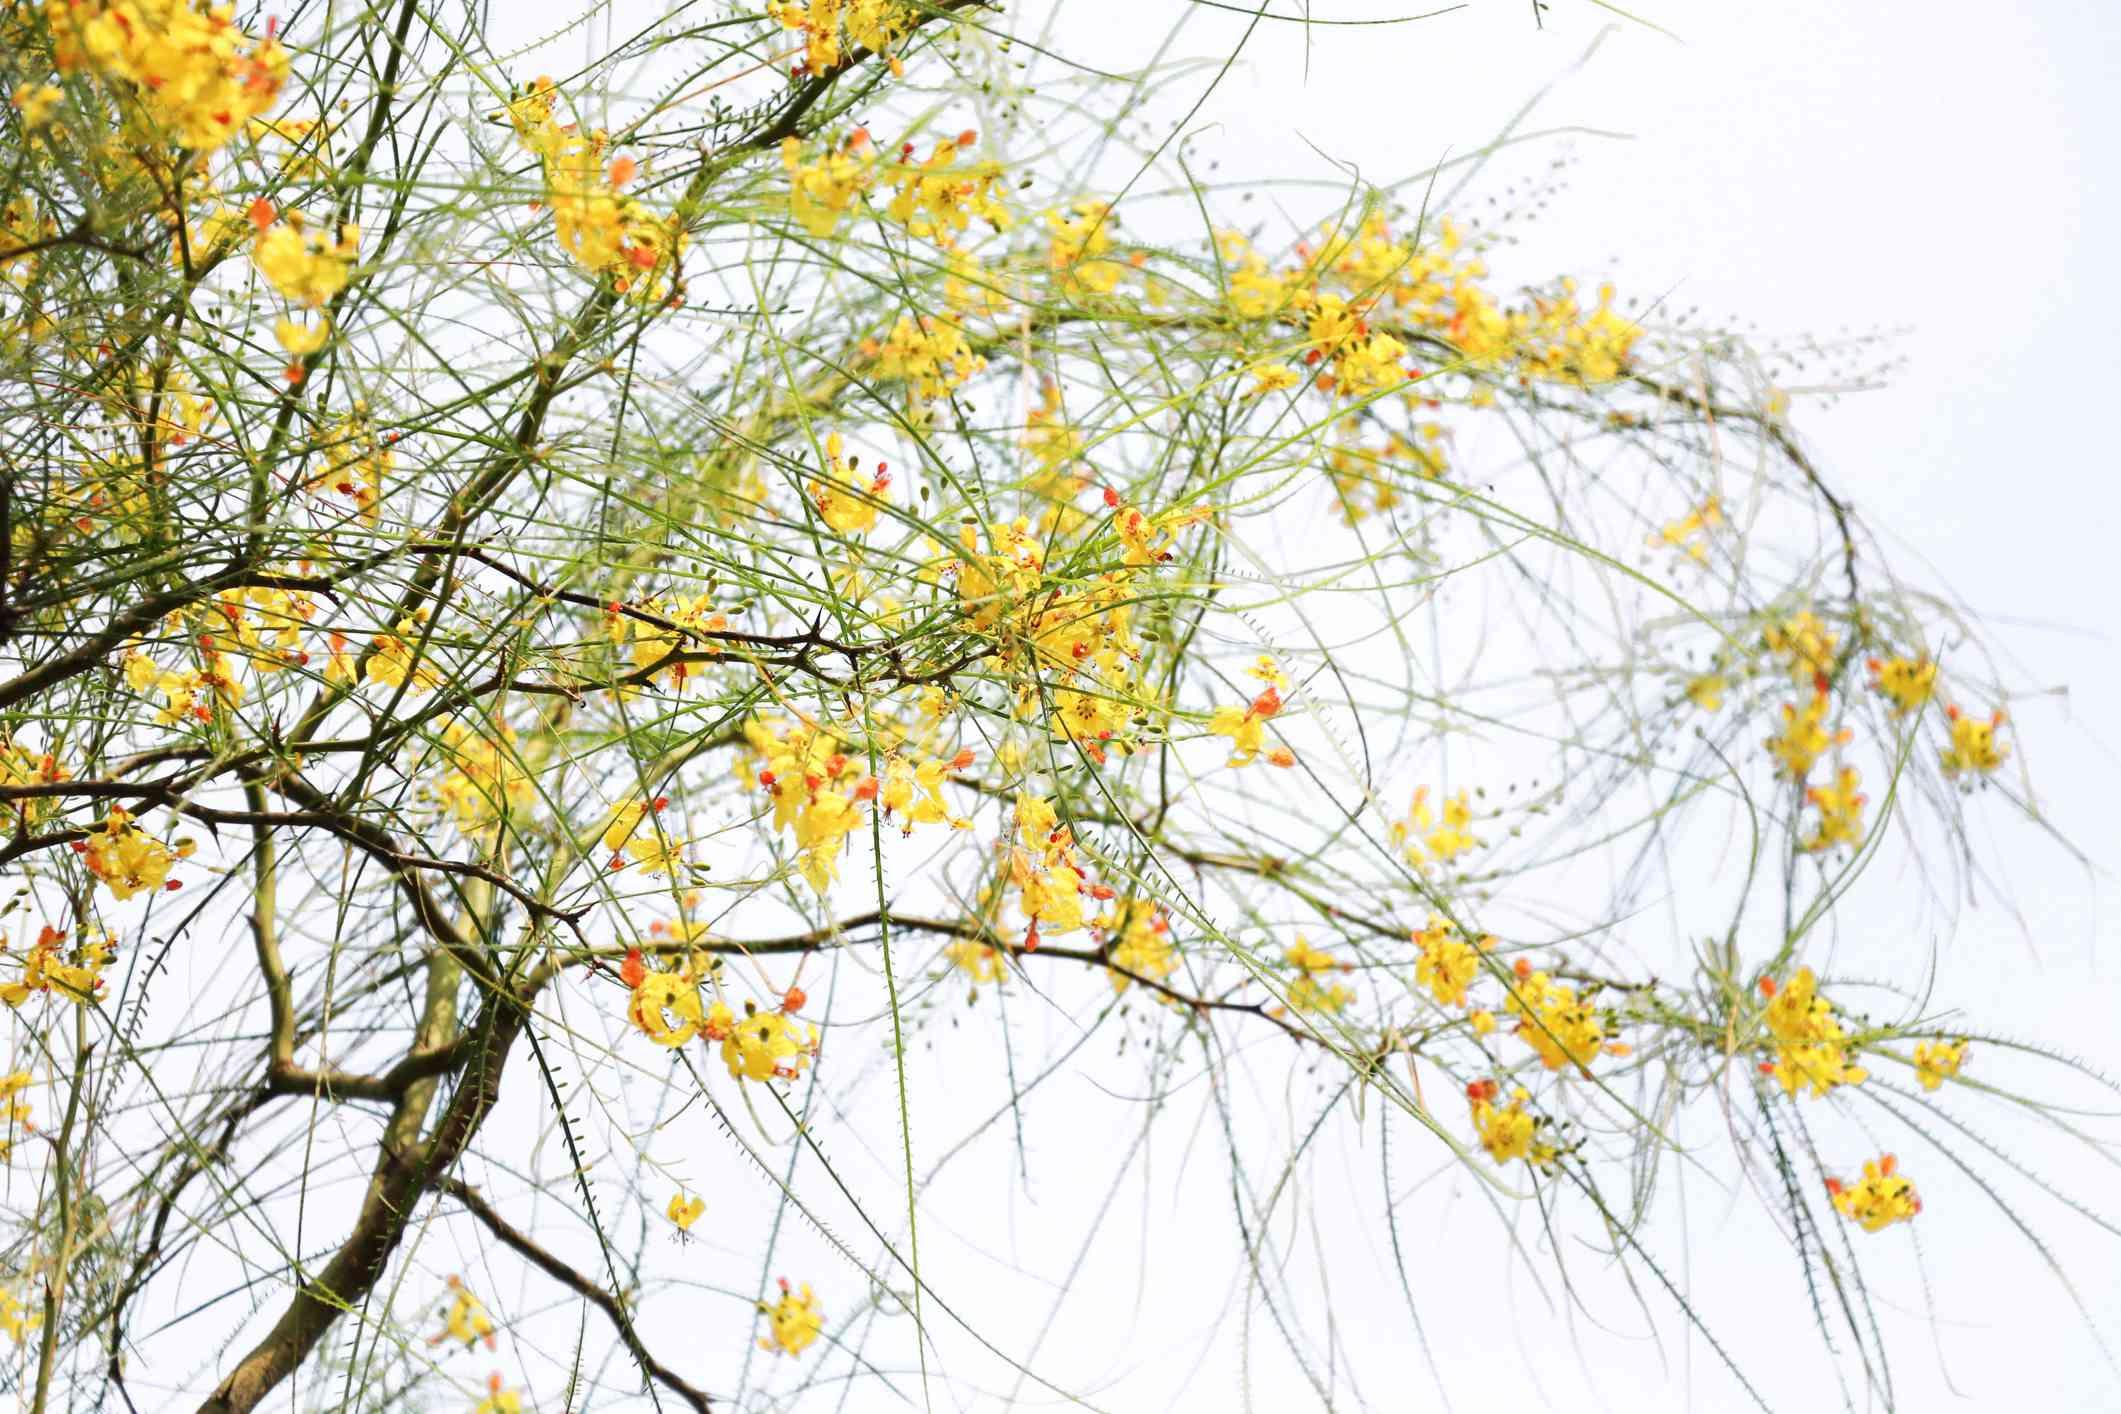 Palo Verde (Parkinsonia aculeata)